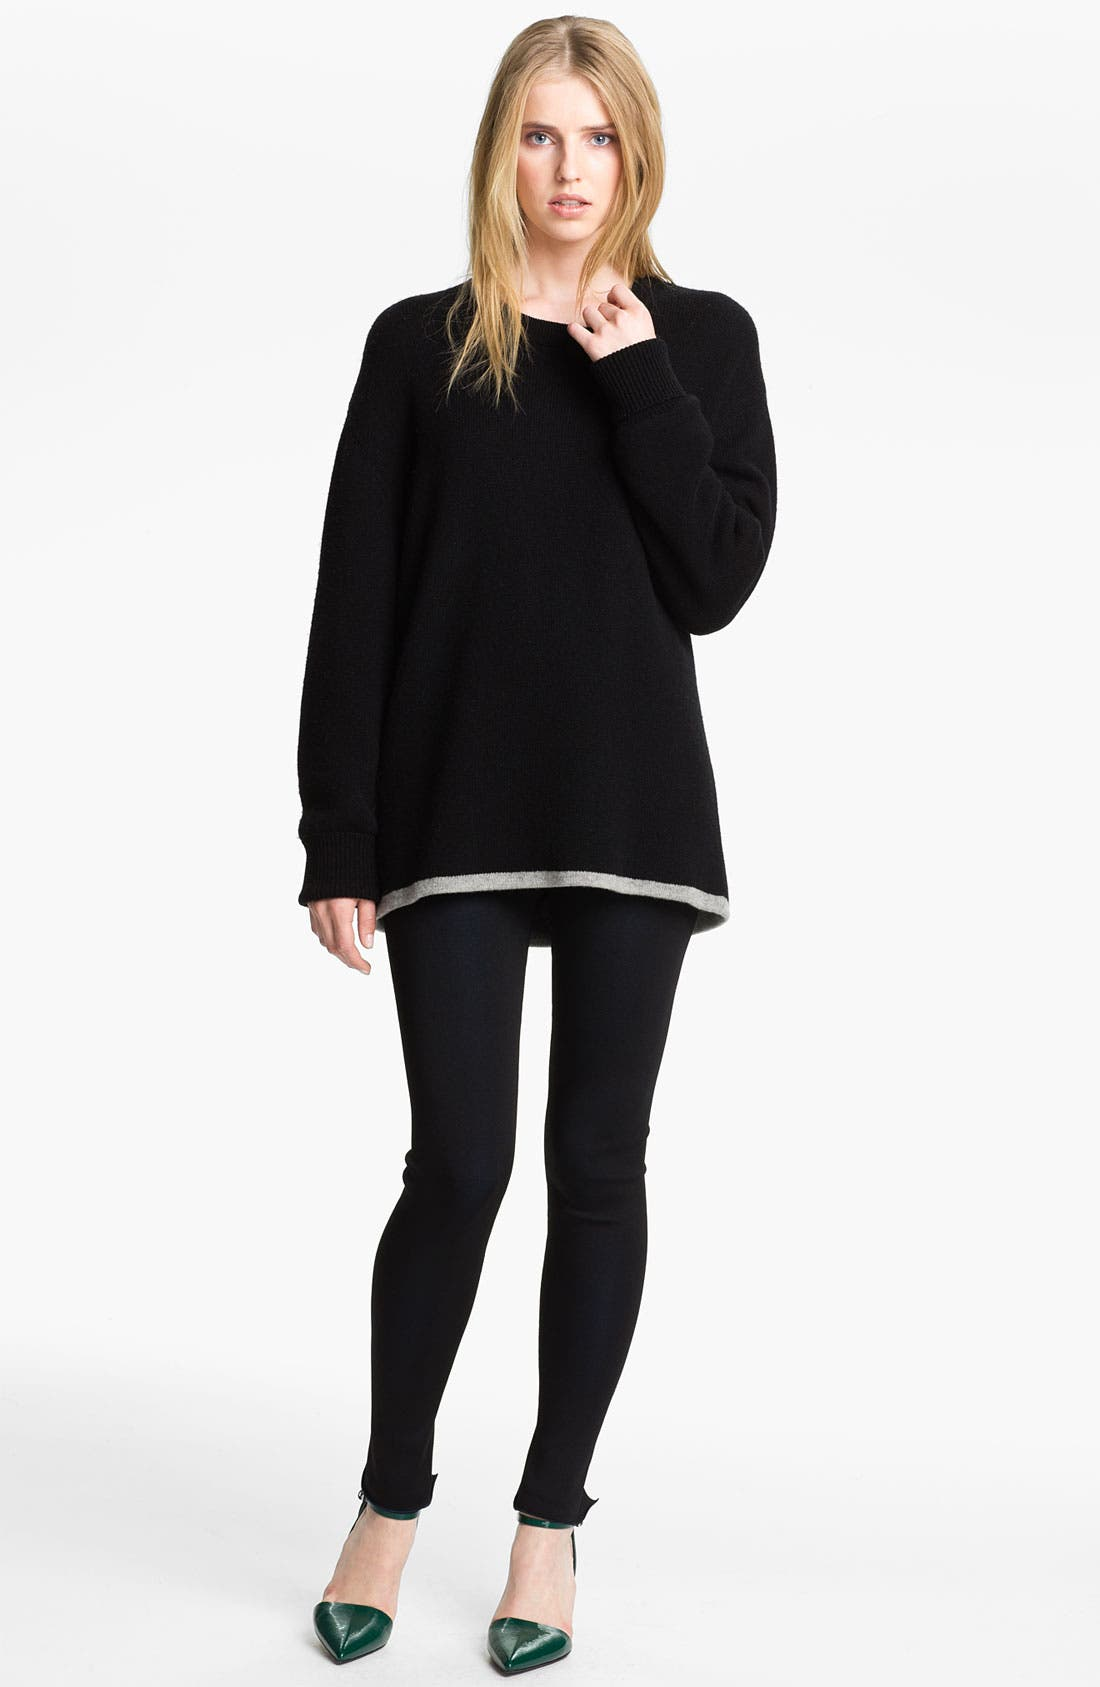 Alternate Image 1 Selected - Alexander Wang Reversible Wool & Cashmere Sweatshirt